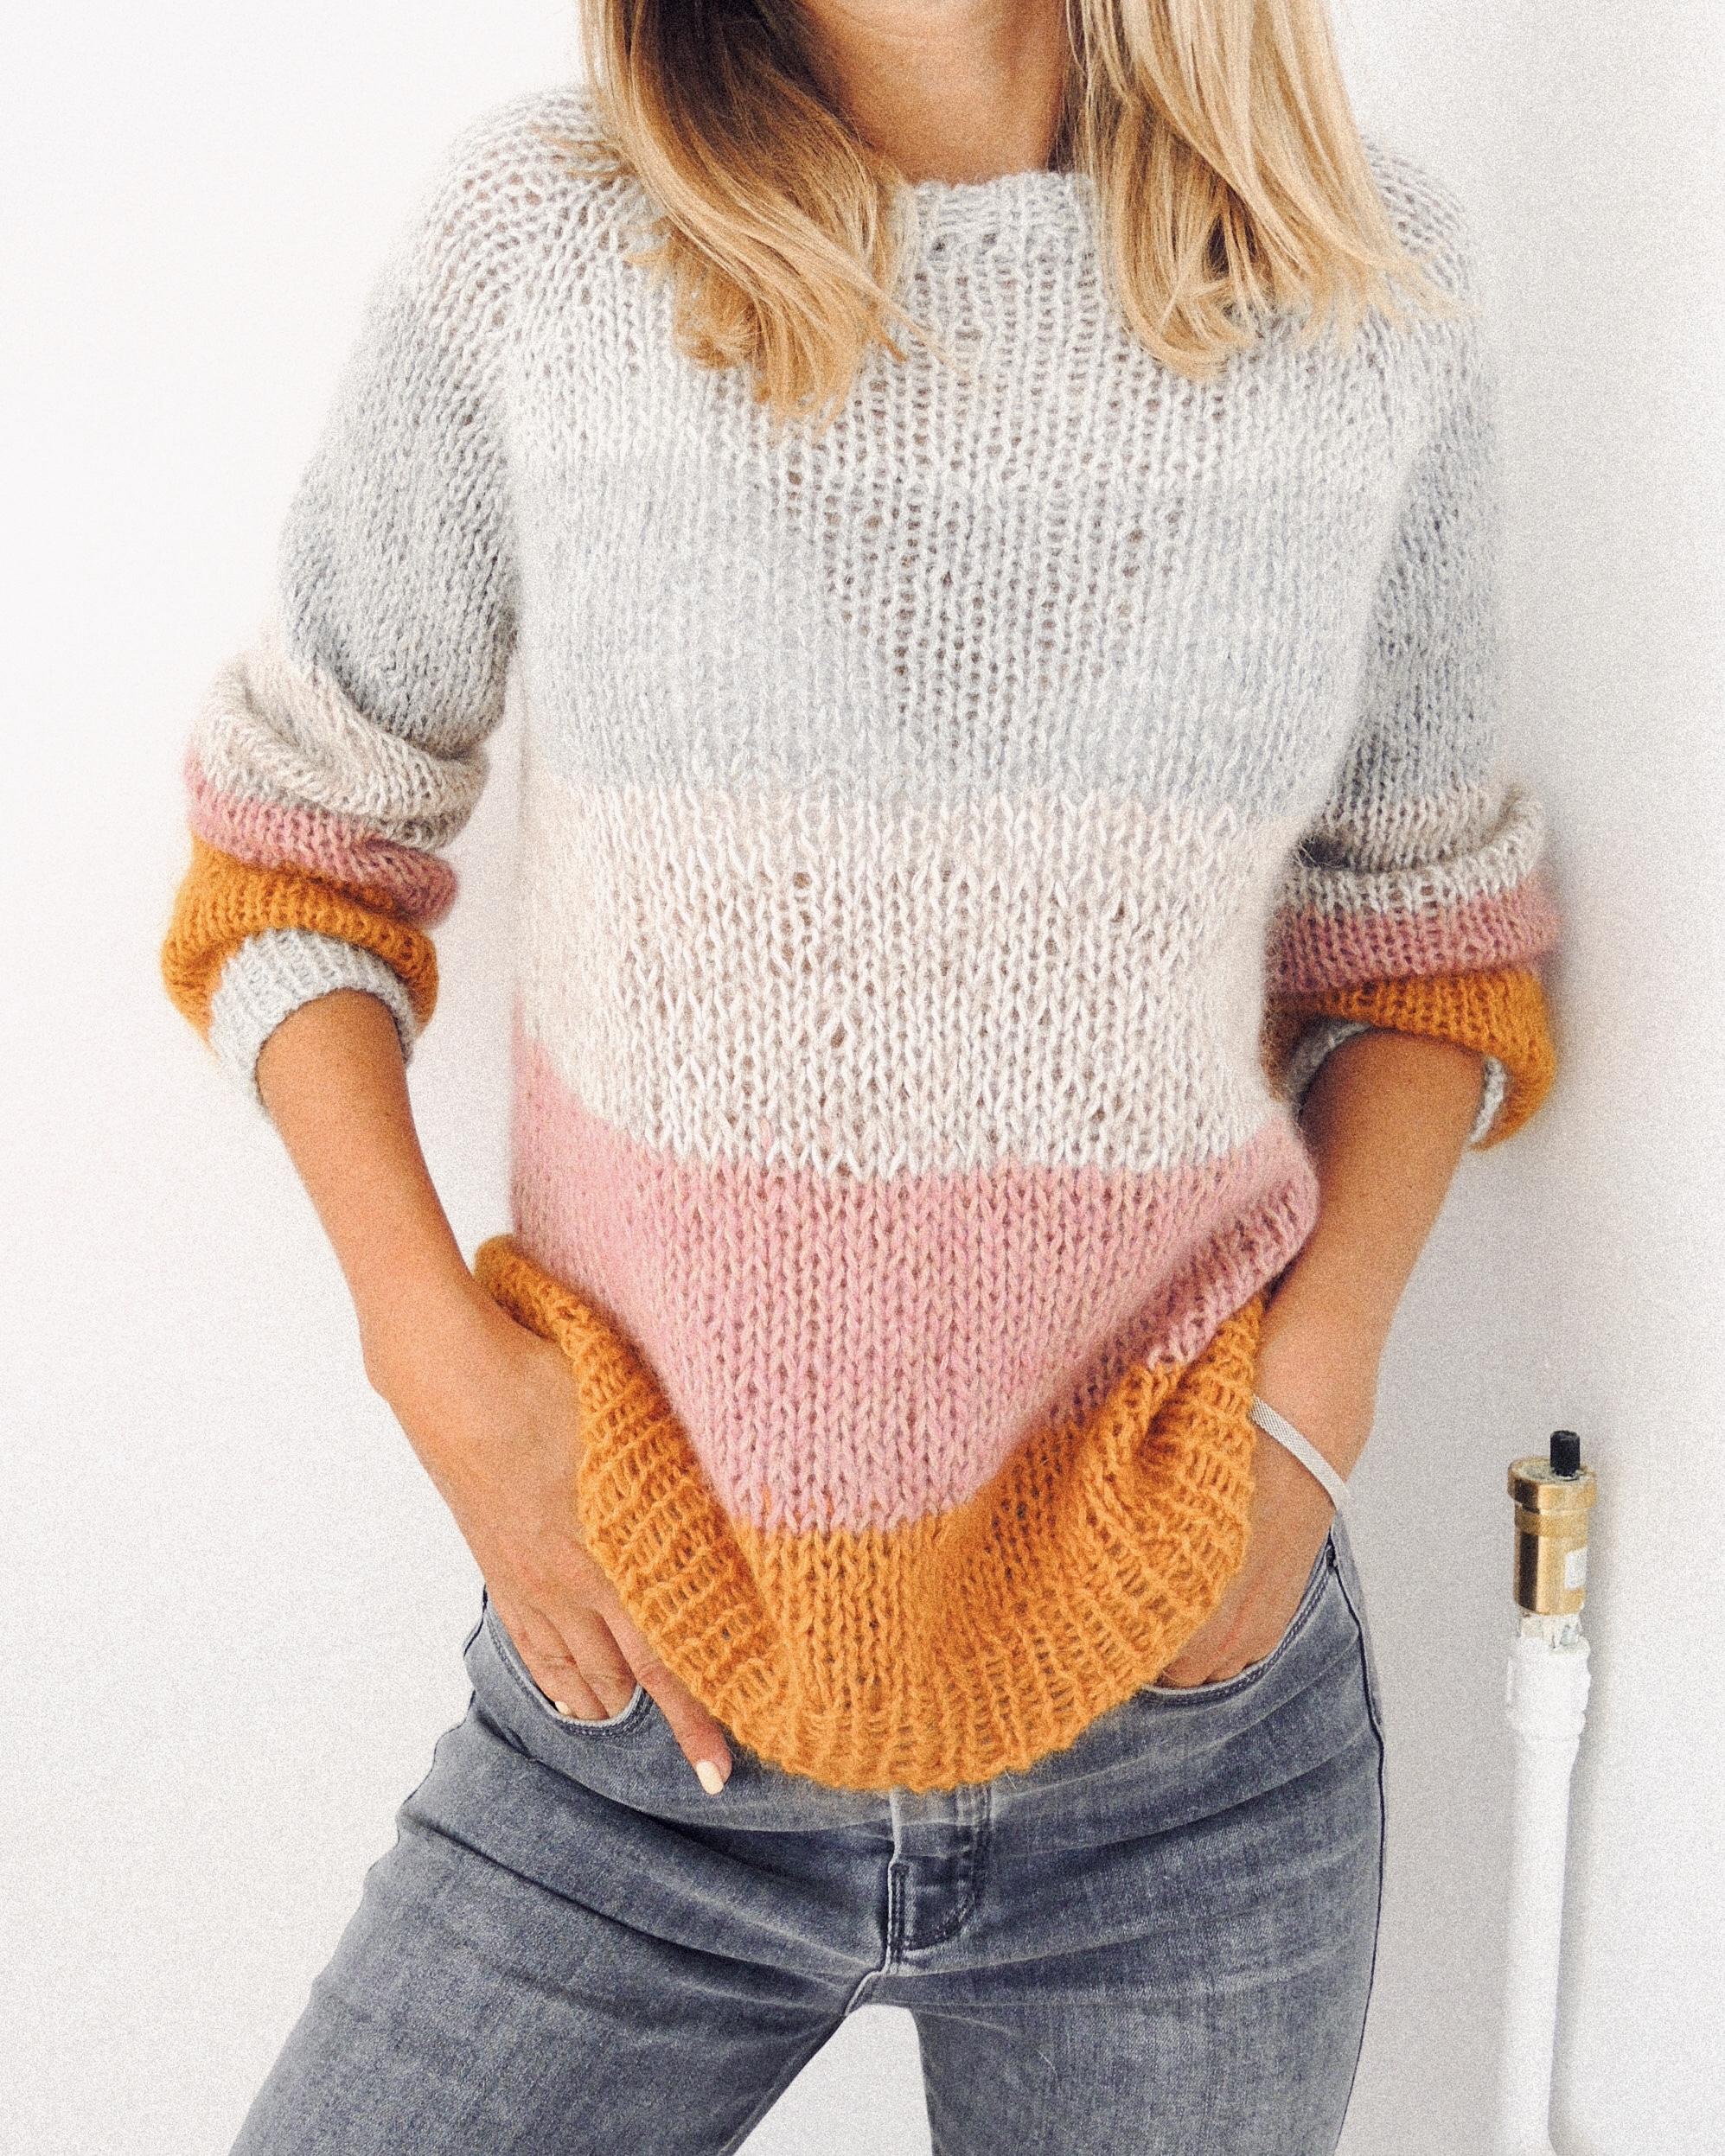 top down raglan sweter, sweter robiony na drutach, sweter robiony od góry, knitted sweater, knitting pattern, wzór na drutach, striped sweater, sweter w pasy